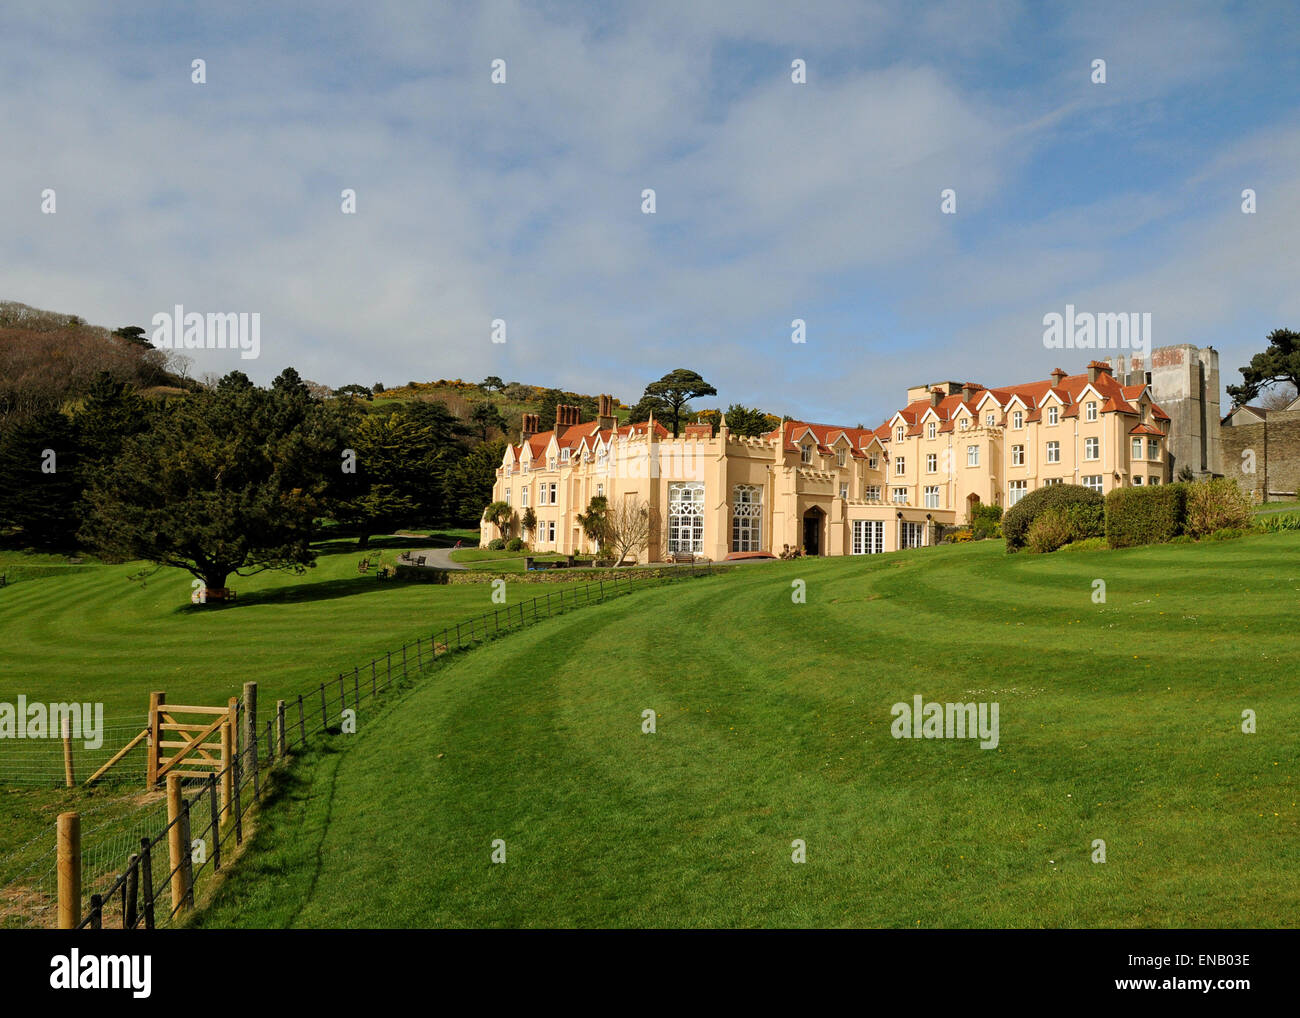 Lee Abbey. Ecumenical Christian Organisation, Retreat and Holiday Centre near Lynton North Devon - Stock Image